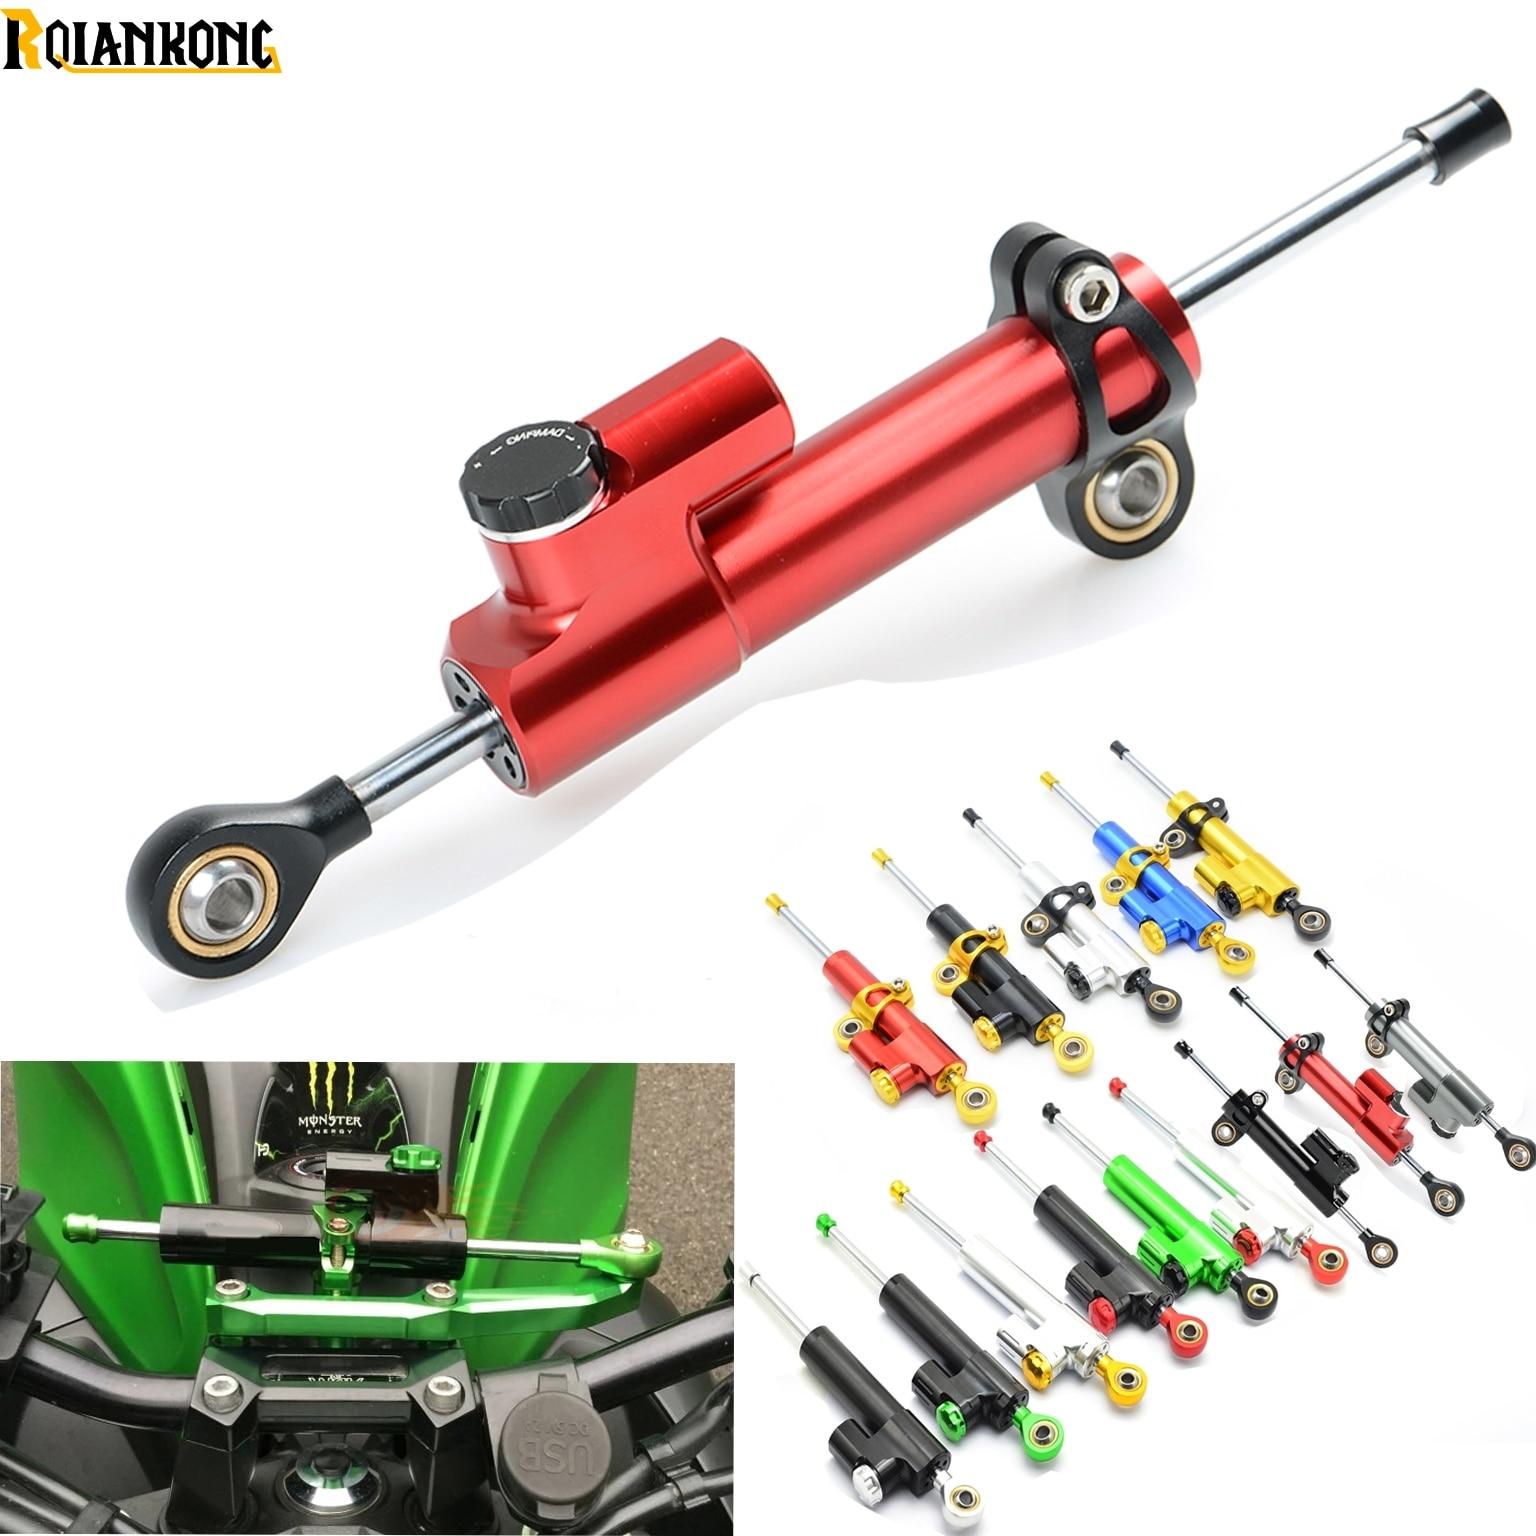 CNC Aluminum Motorcycle Steering Damper Stabilizer Linear Safe Control for TRIUMPH ROCKET III CLASSIC ROADSTER SCRAMBLER<br>